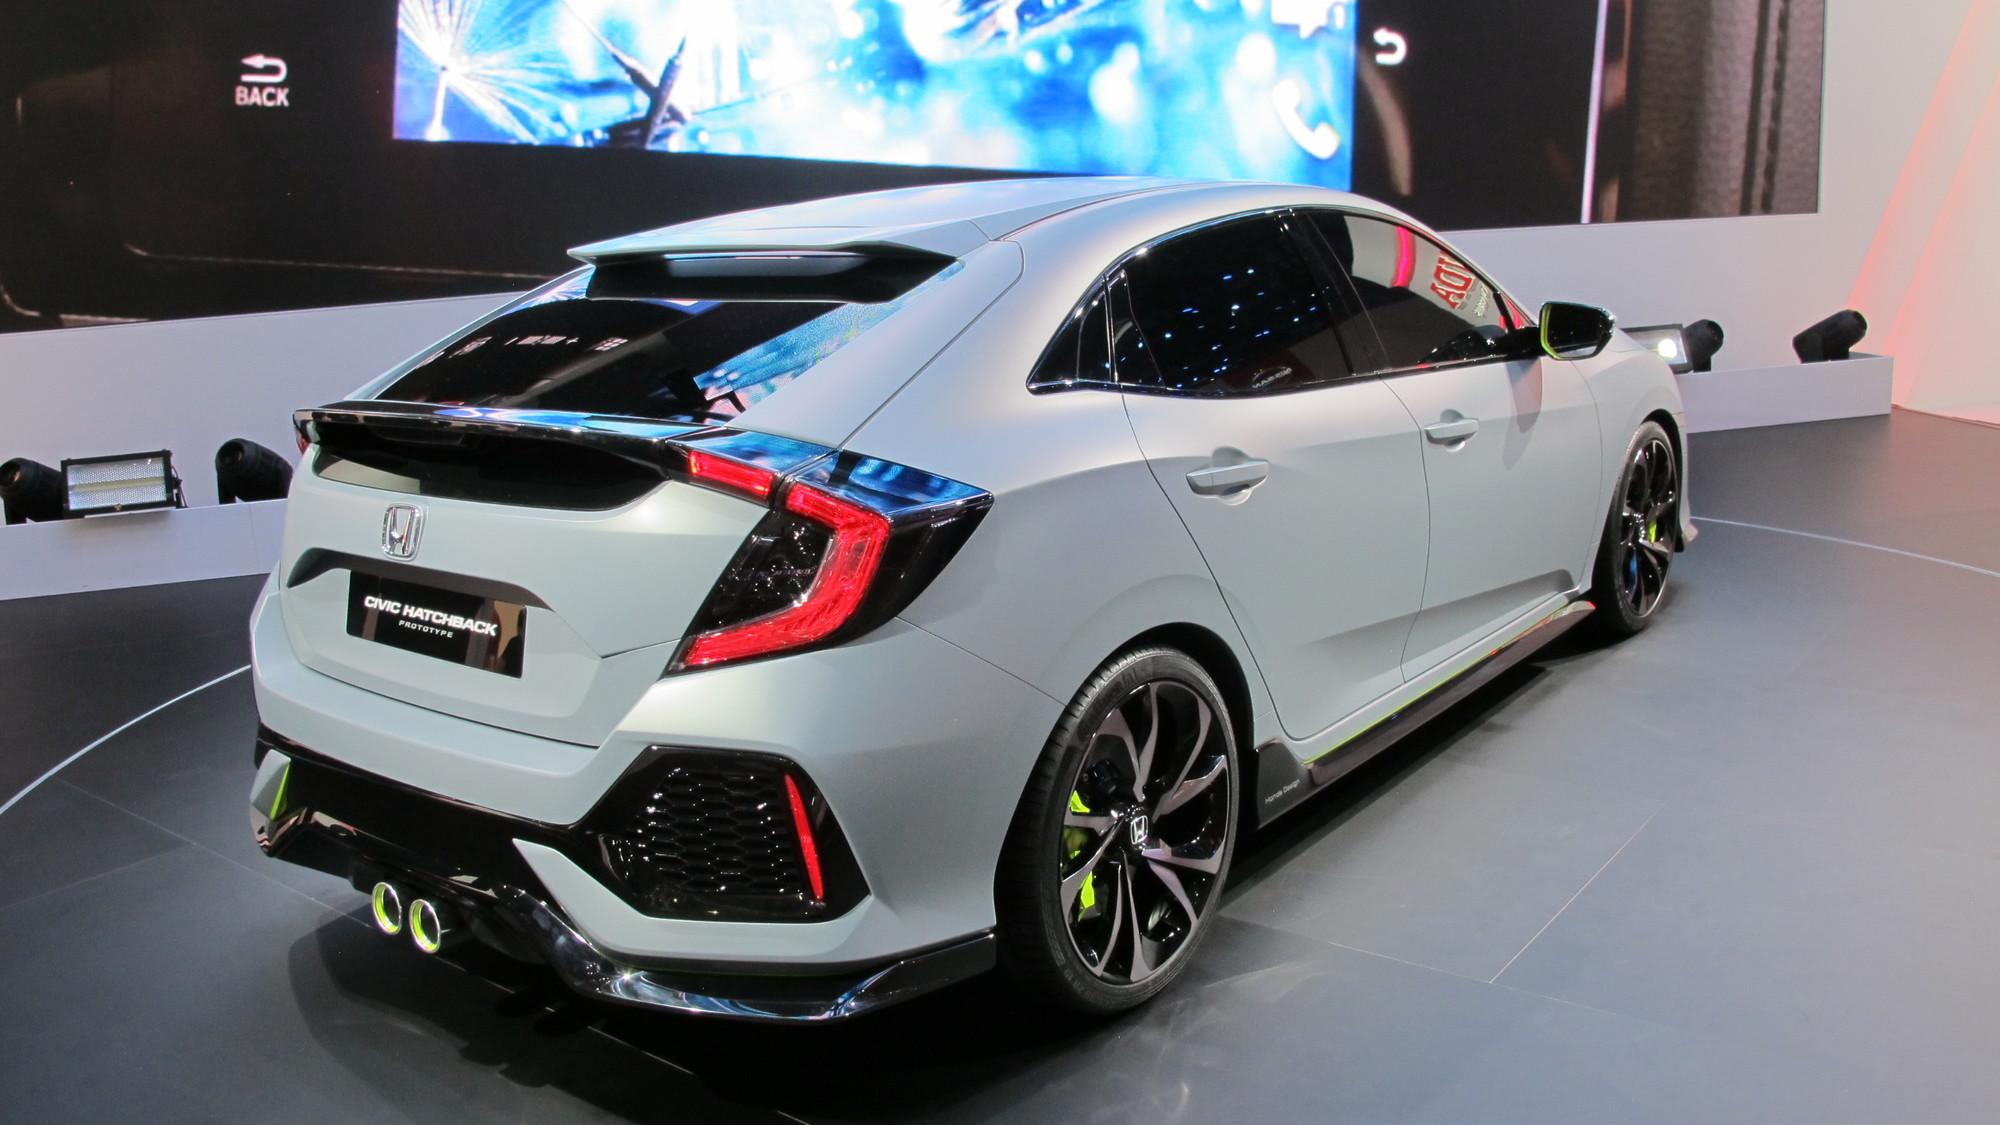 2017 Honda Civic Hatchback Prototype 2016 Geneva Motor Show